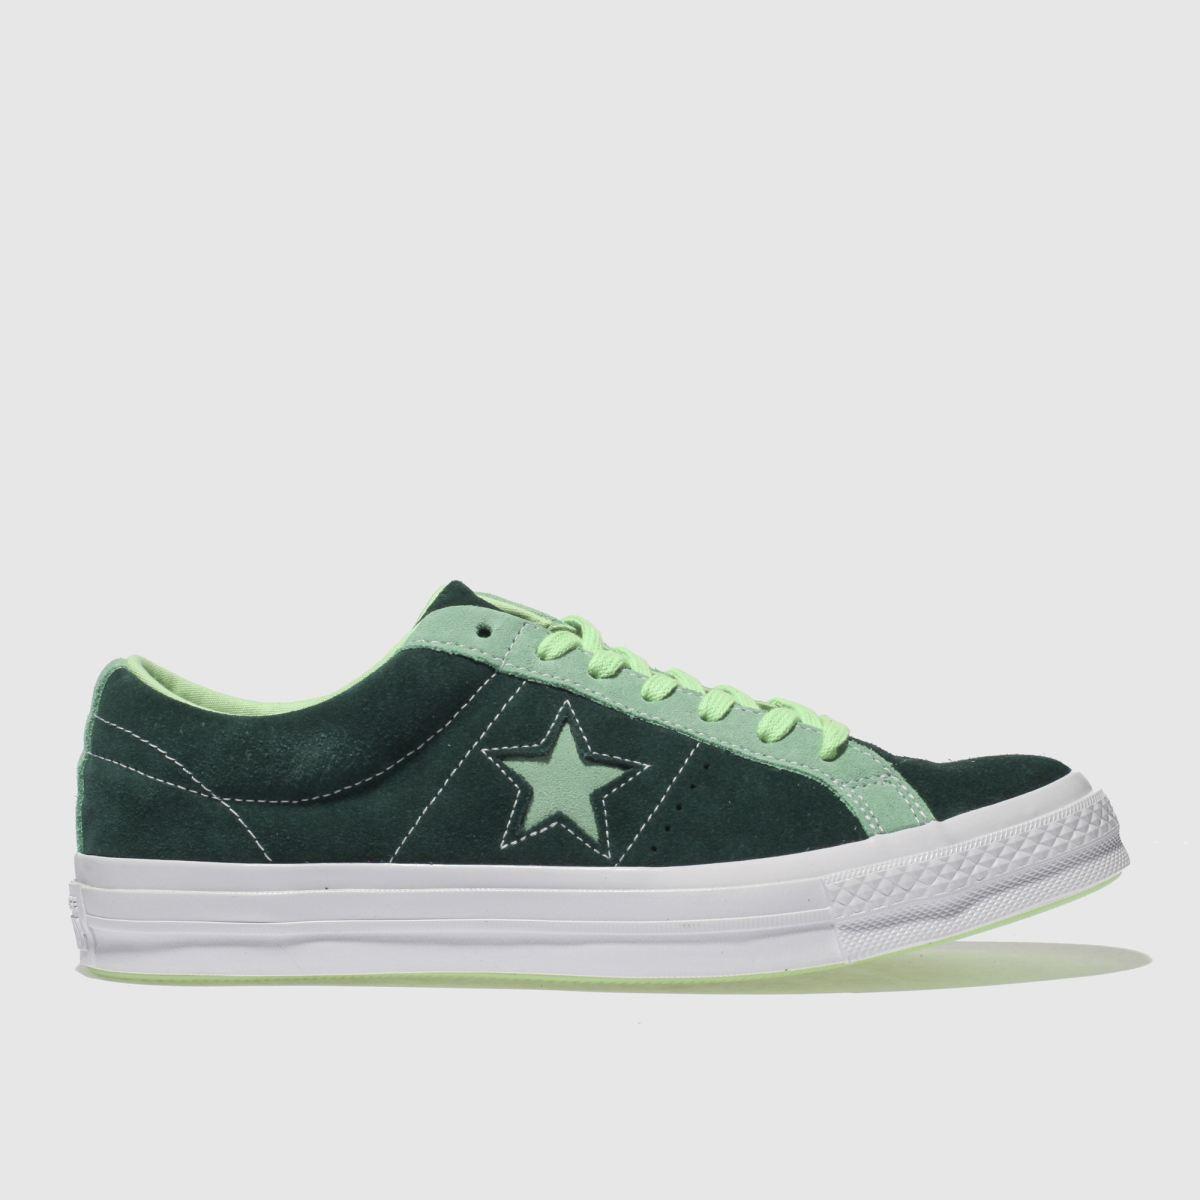 Converse Dark Green One Star Ox Trainers